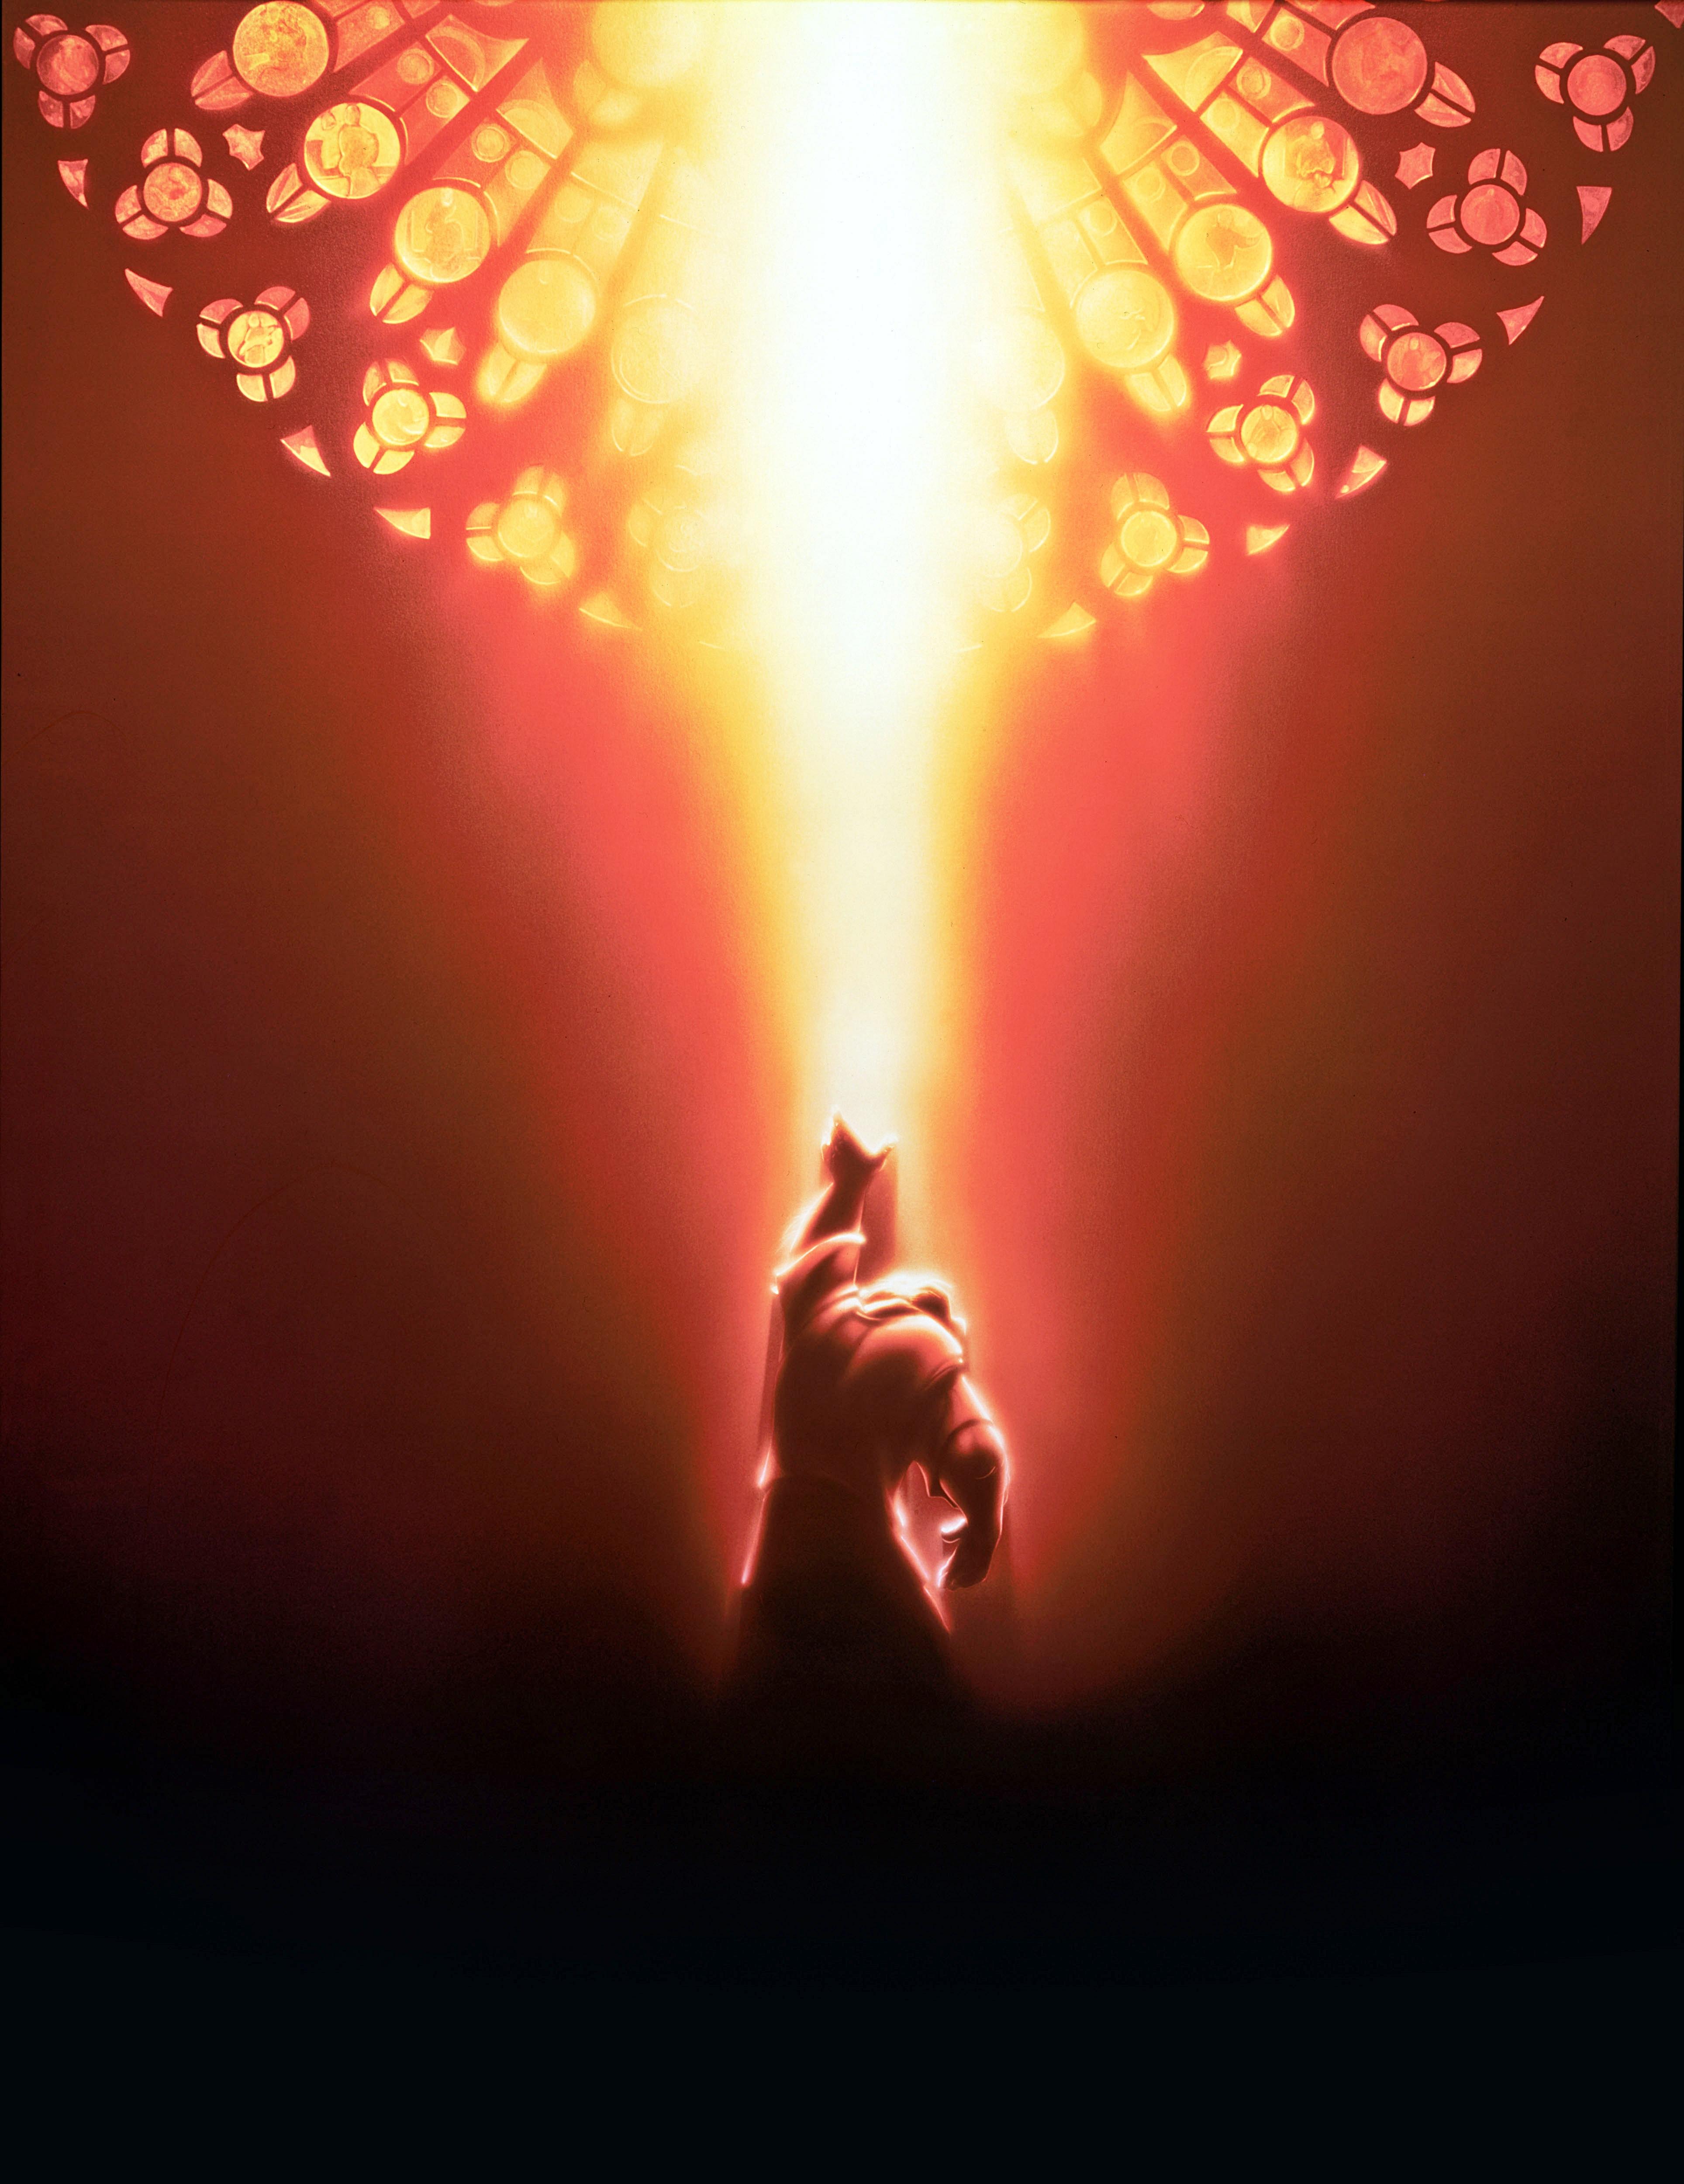 Walt 디즈니 Posters - The Hunchback of Notre Dame